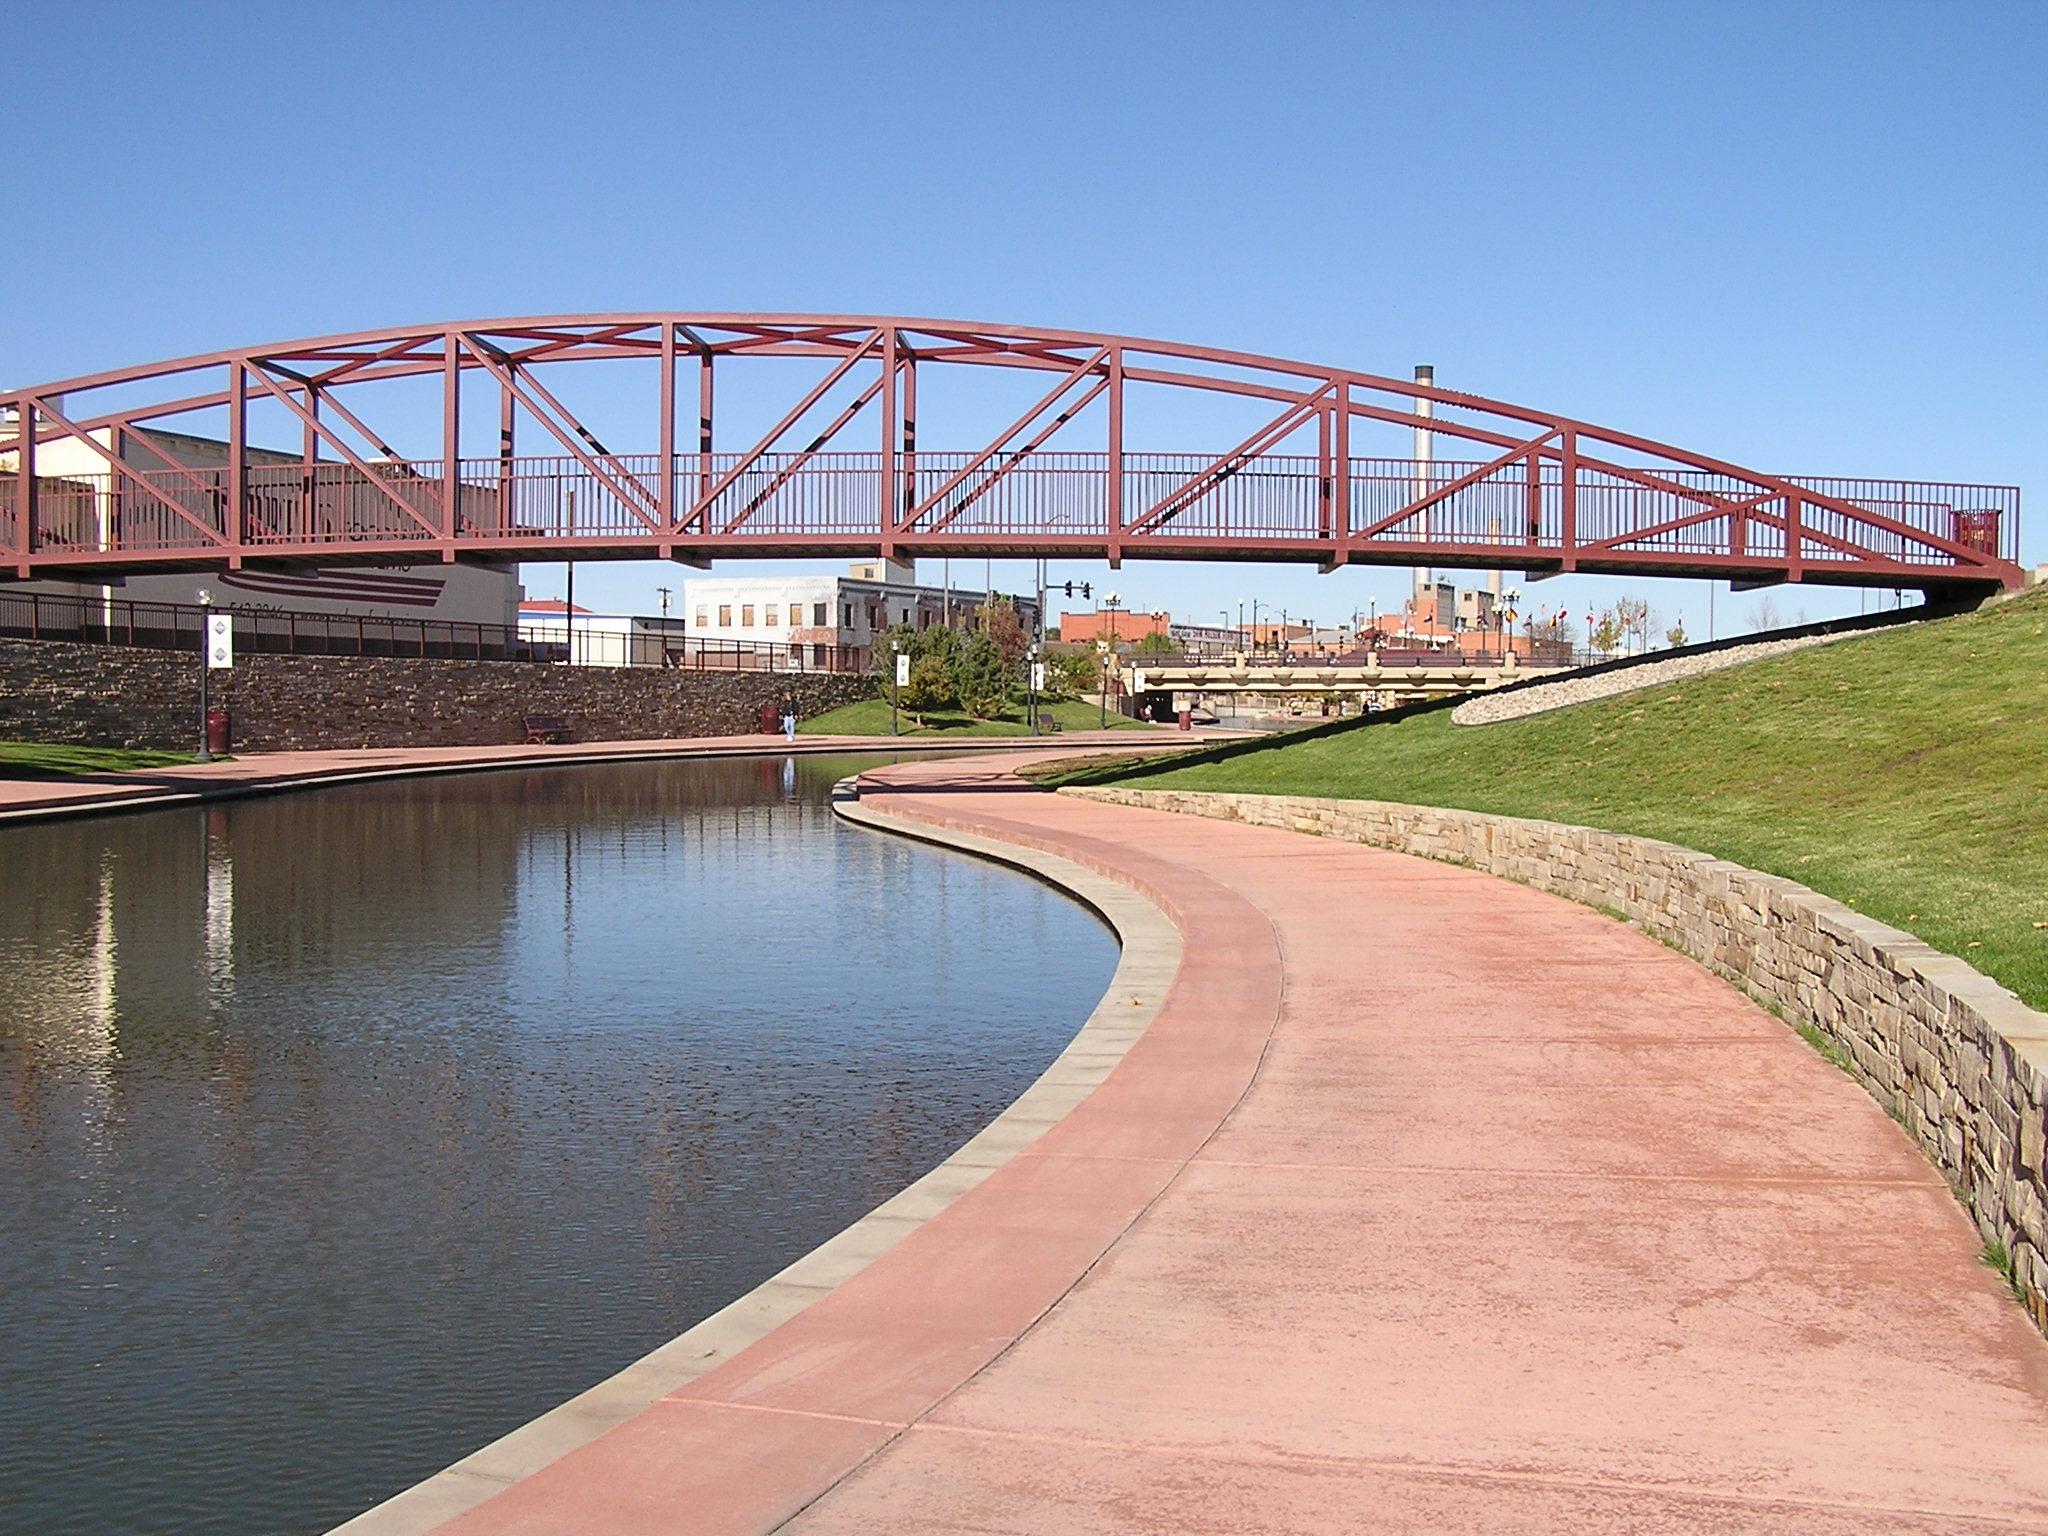 a section of the historic arkansas riverwalk near downtown pueblo, colorado.